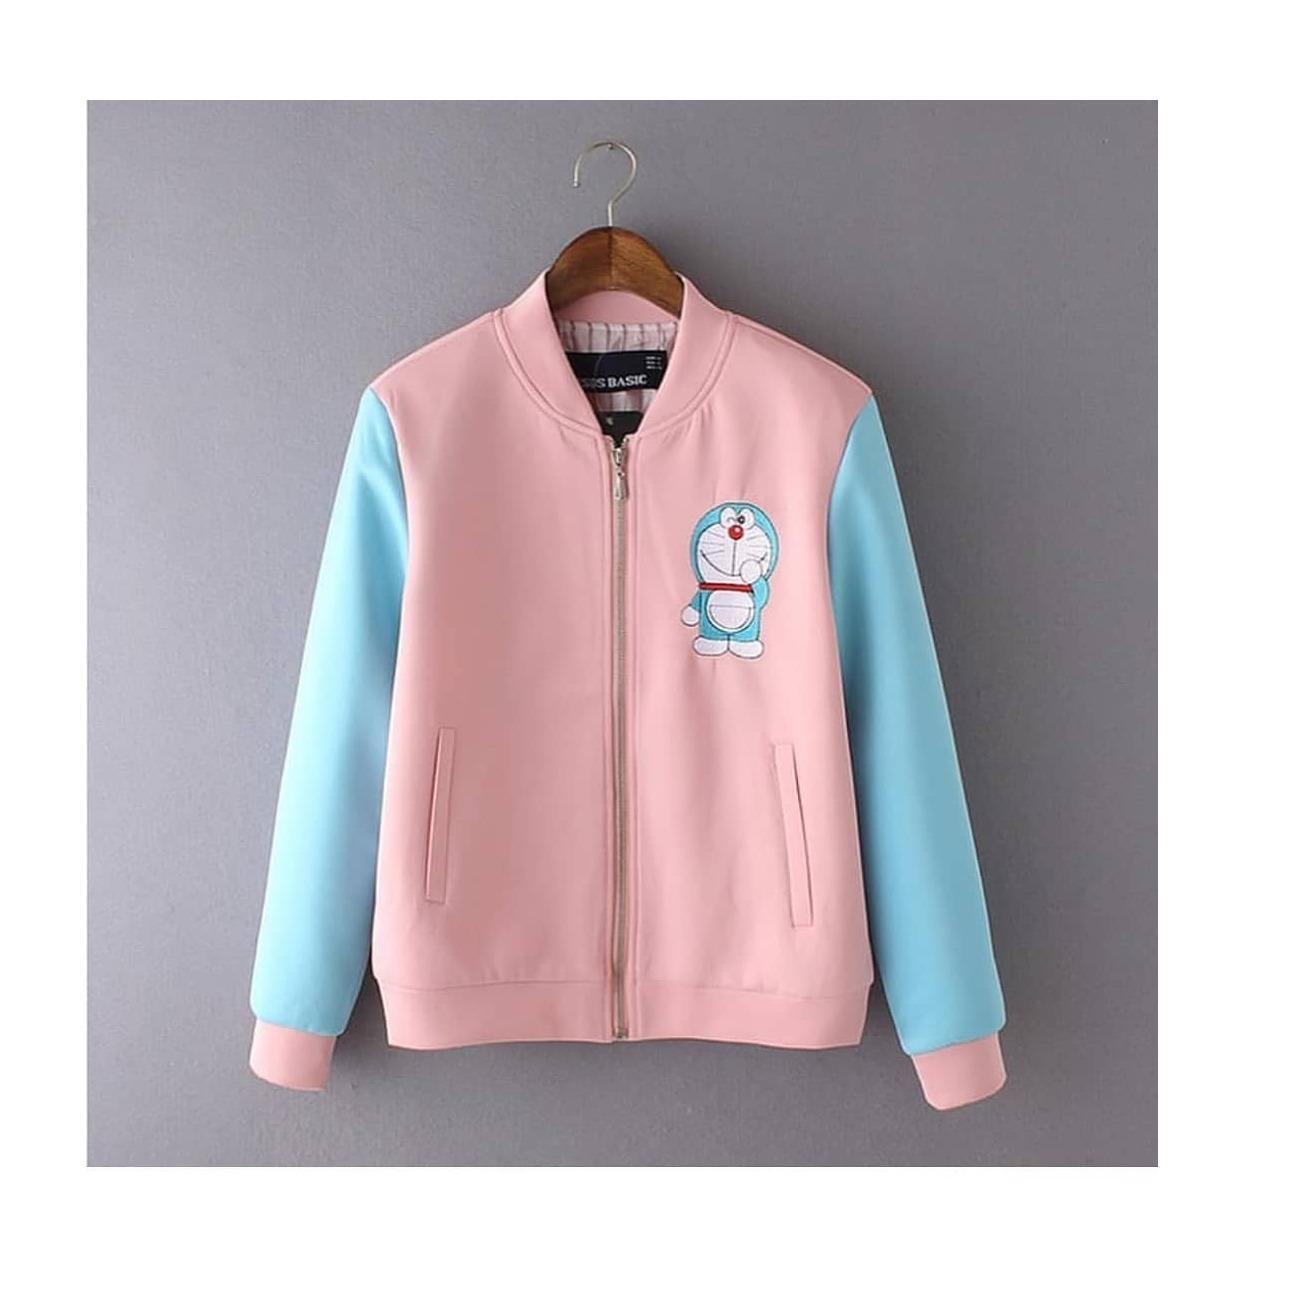 "Sweater&Jaket ""SF SMILE DORA"" Lucu Untuk Wanita Bahan Fleece Babyterry Kanvas Jeans Santai Murah Keren Trendy Fashionable 2018"